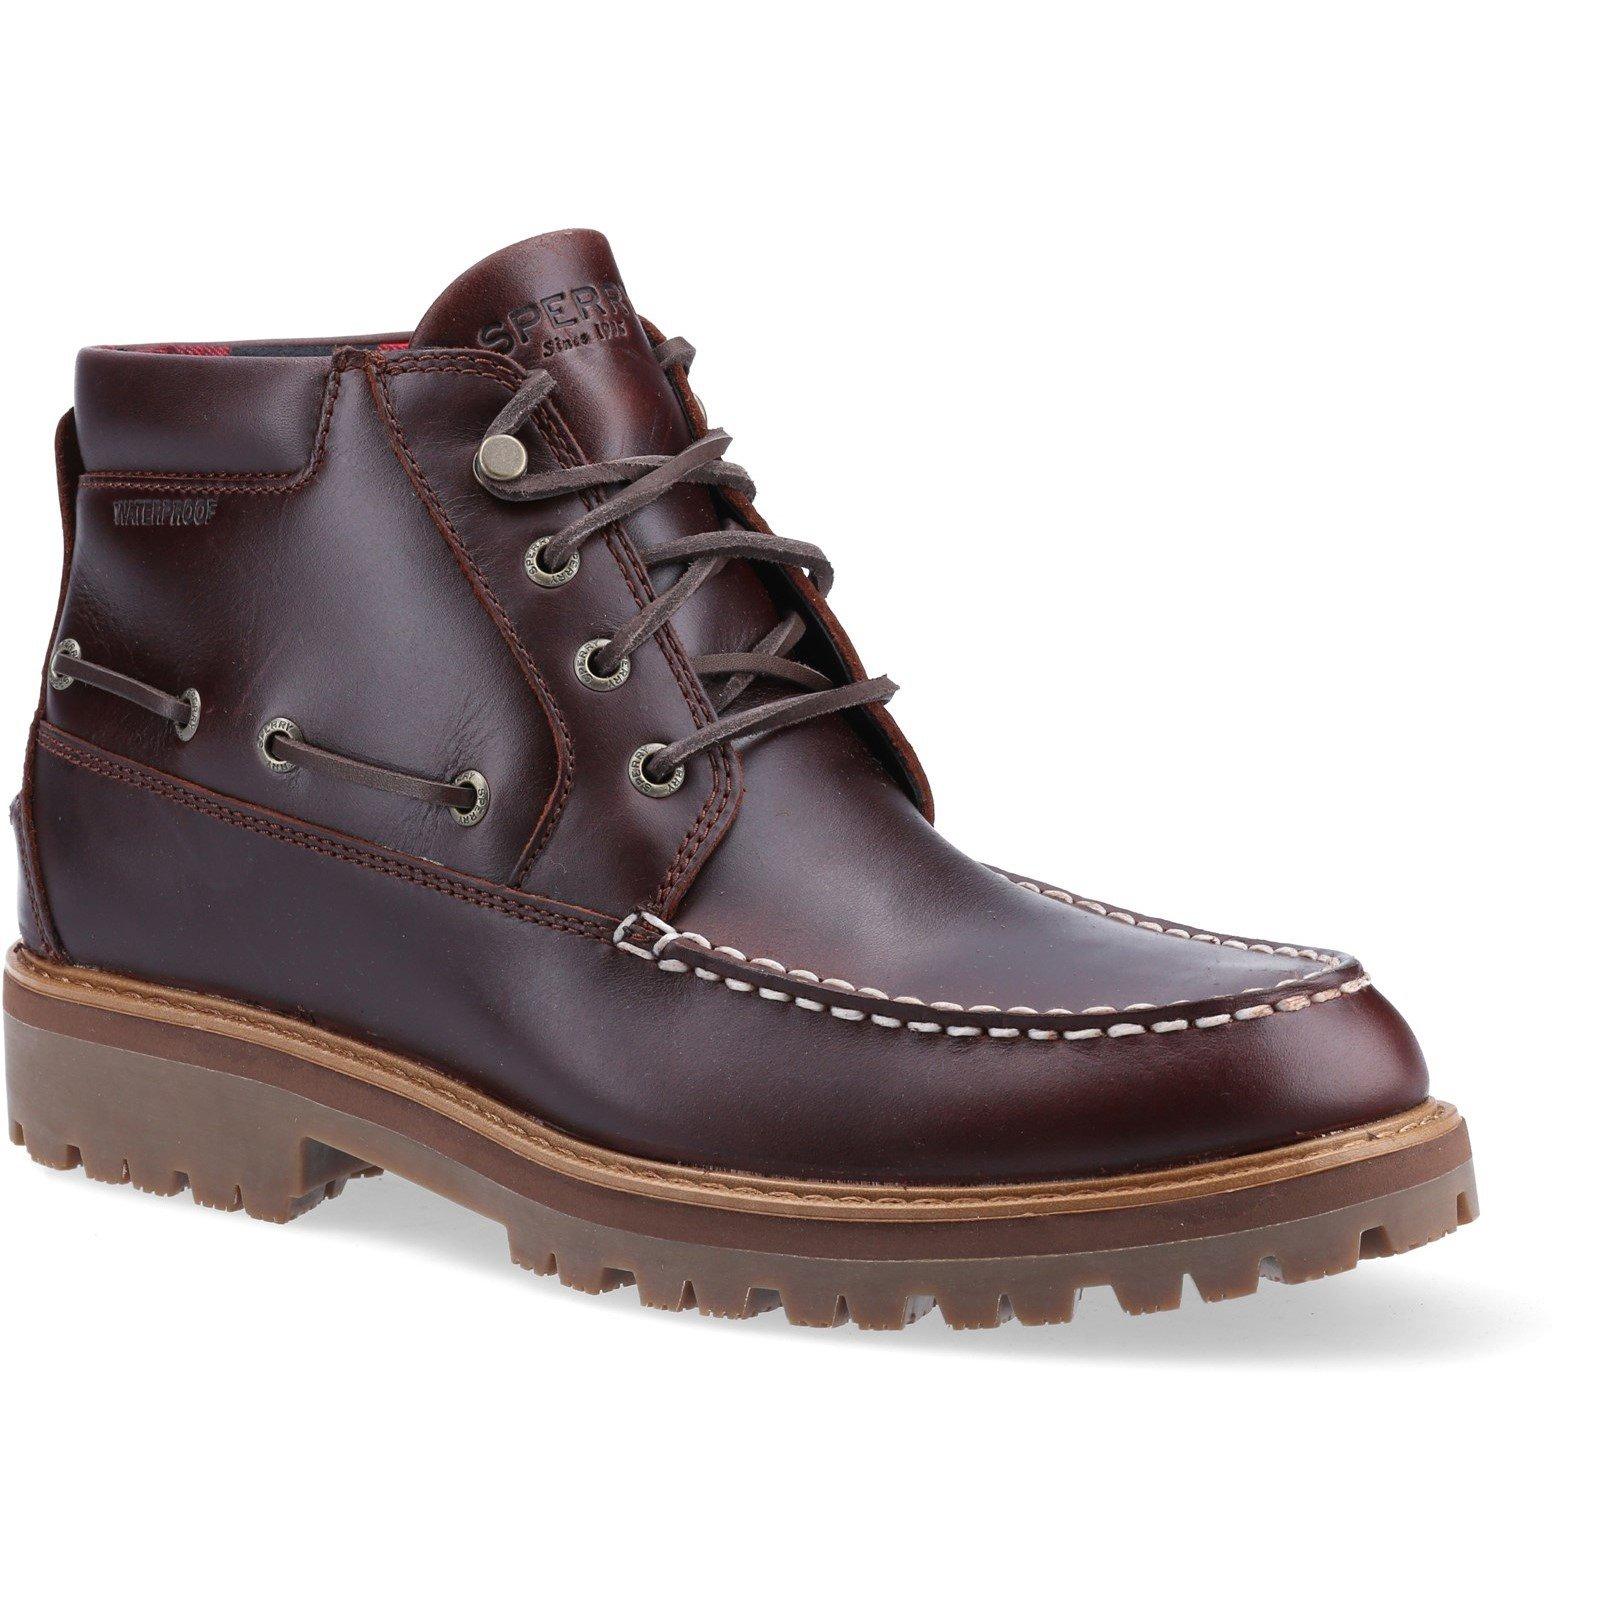 Sperry Men's Authentic Original Lug Chukka Boot Various Colours 32068 - Amaretto 7